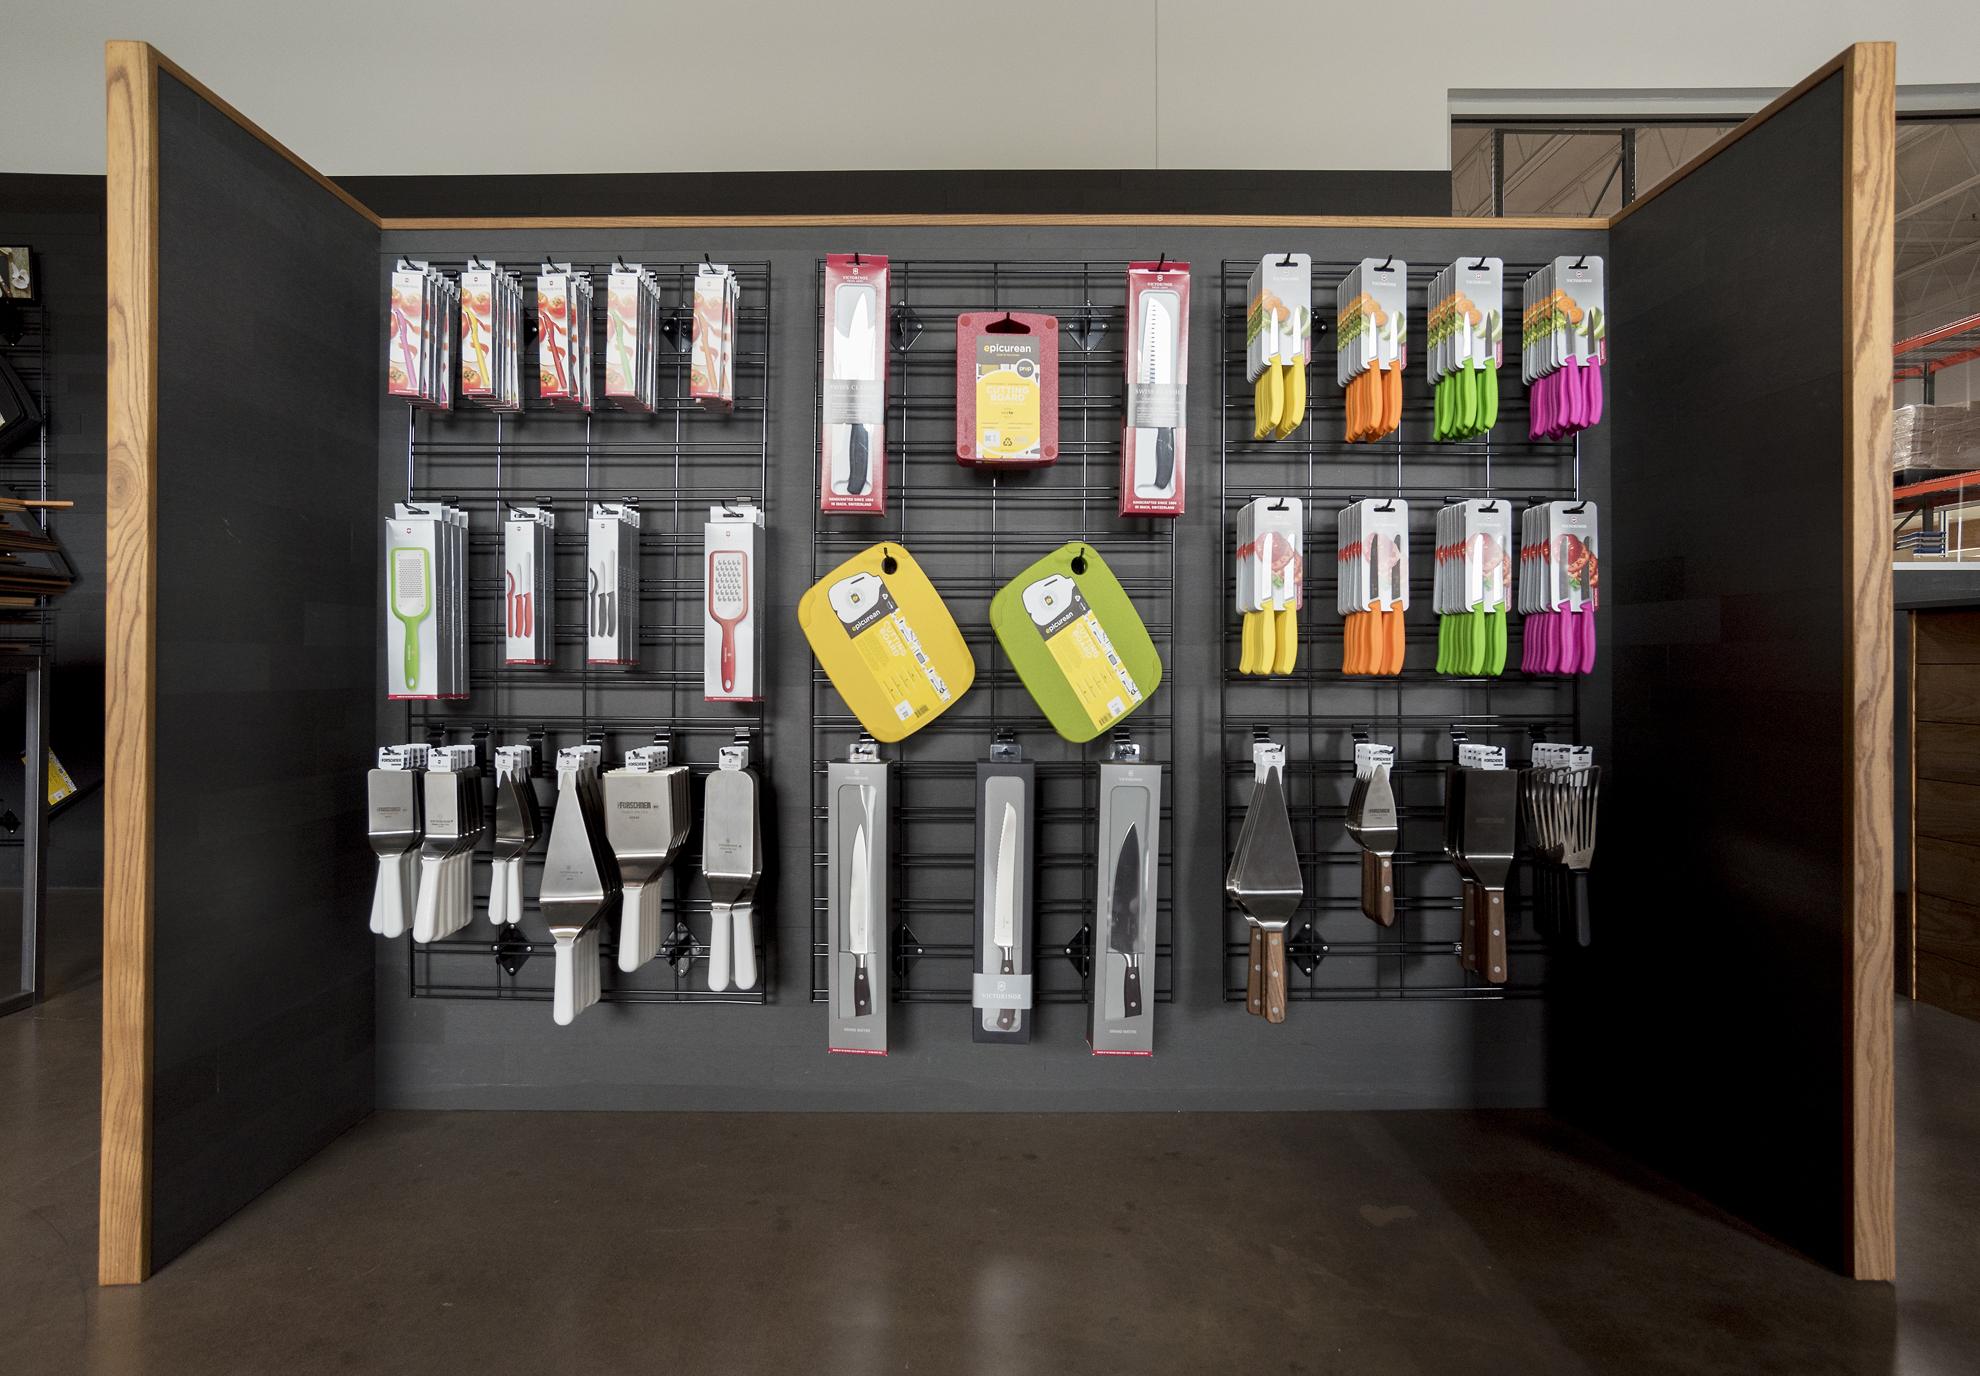 vic kitchen tools_1980px (1).jpg